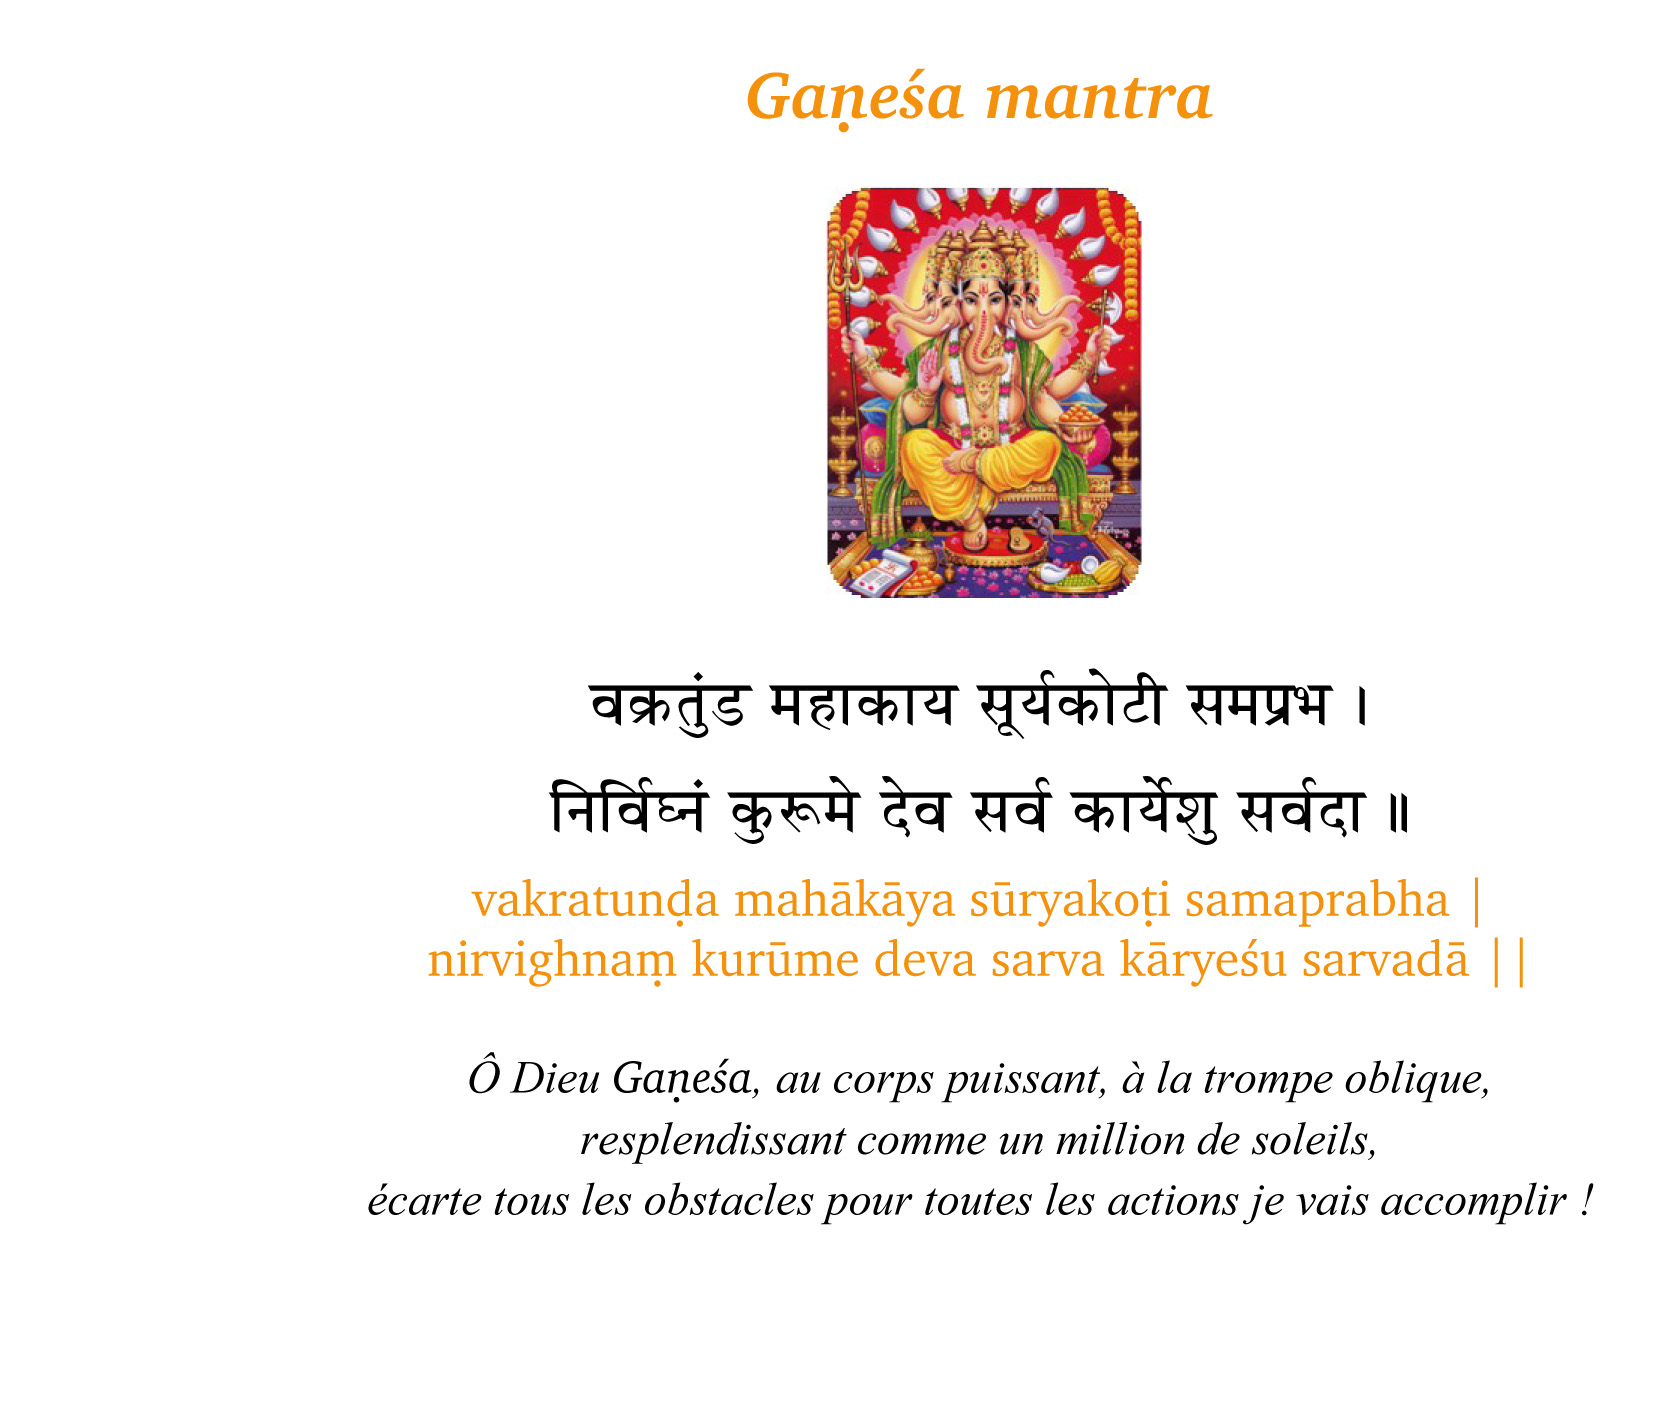 Verset méditation ganesha jayanti